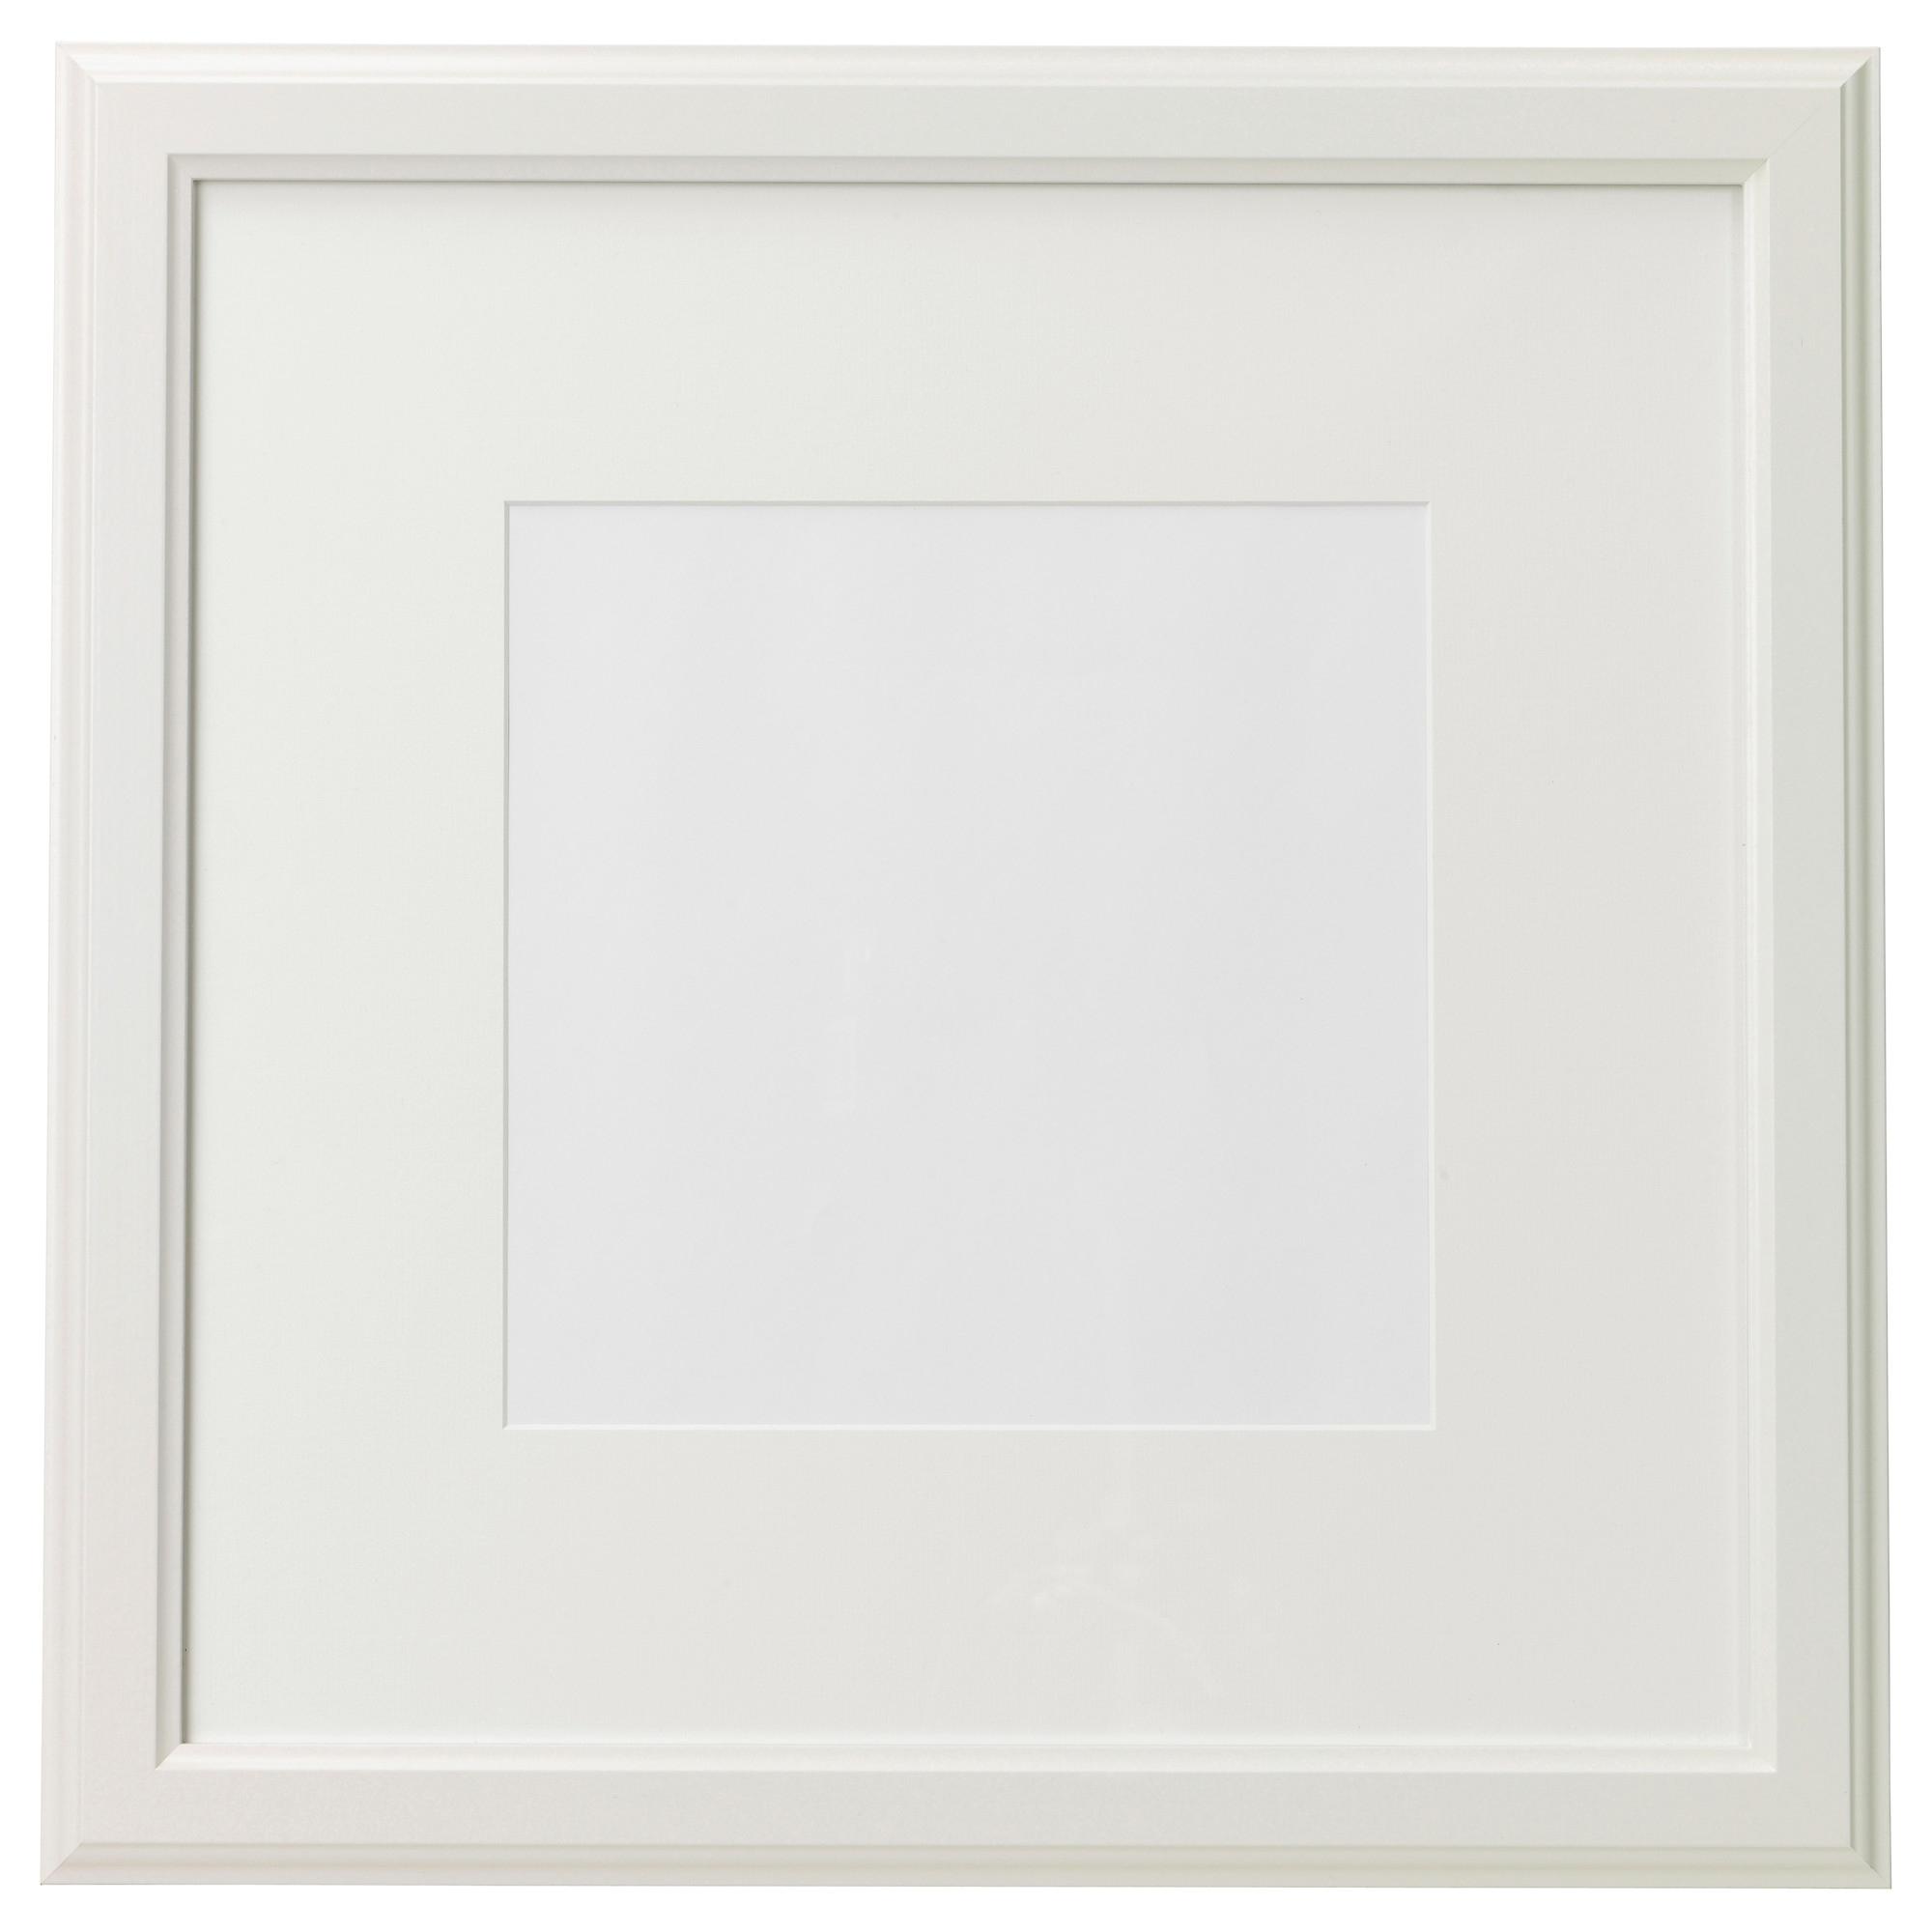 virserum marco 50x50 blanco. Black Bedroom Furniture Sets. Home Design Ideas